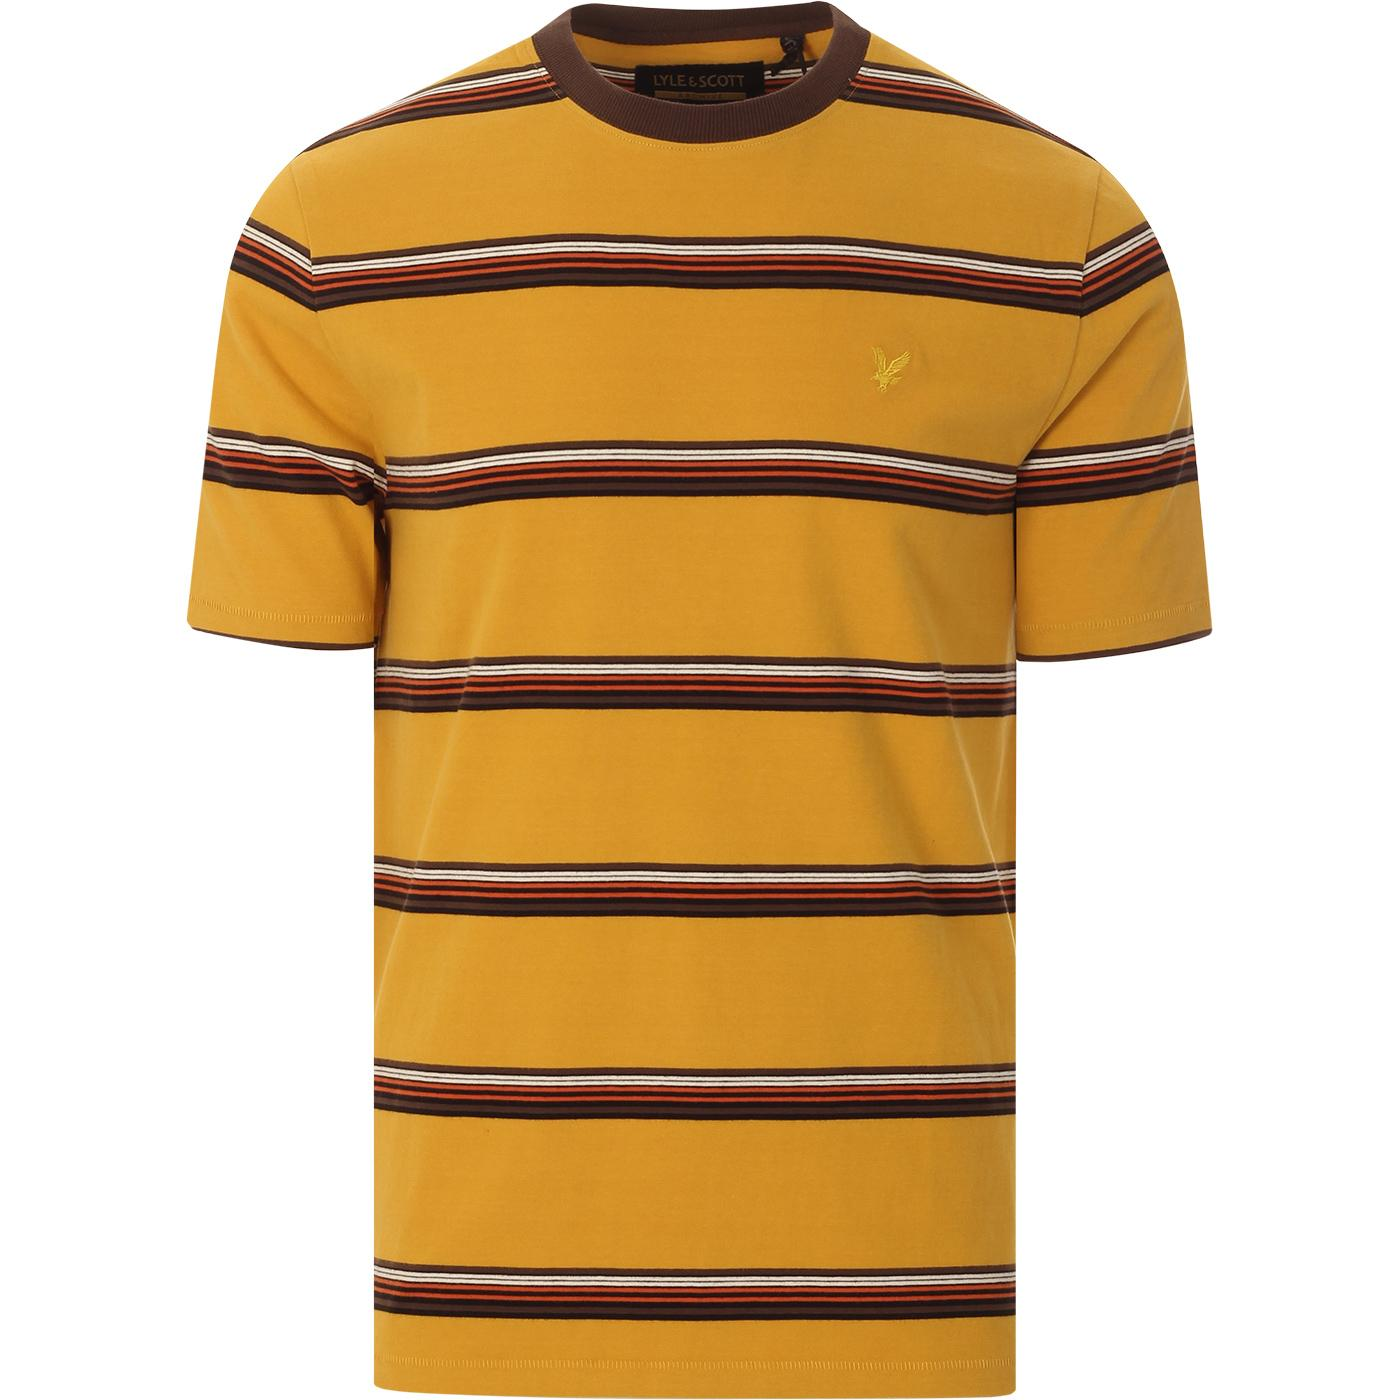 LYLE & SCOTT Retro 70s Multi Stripe T-shirt (A)